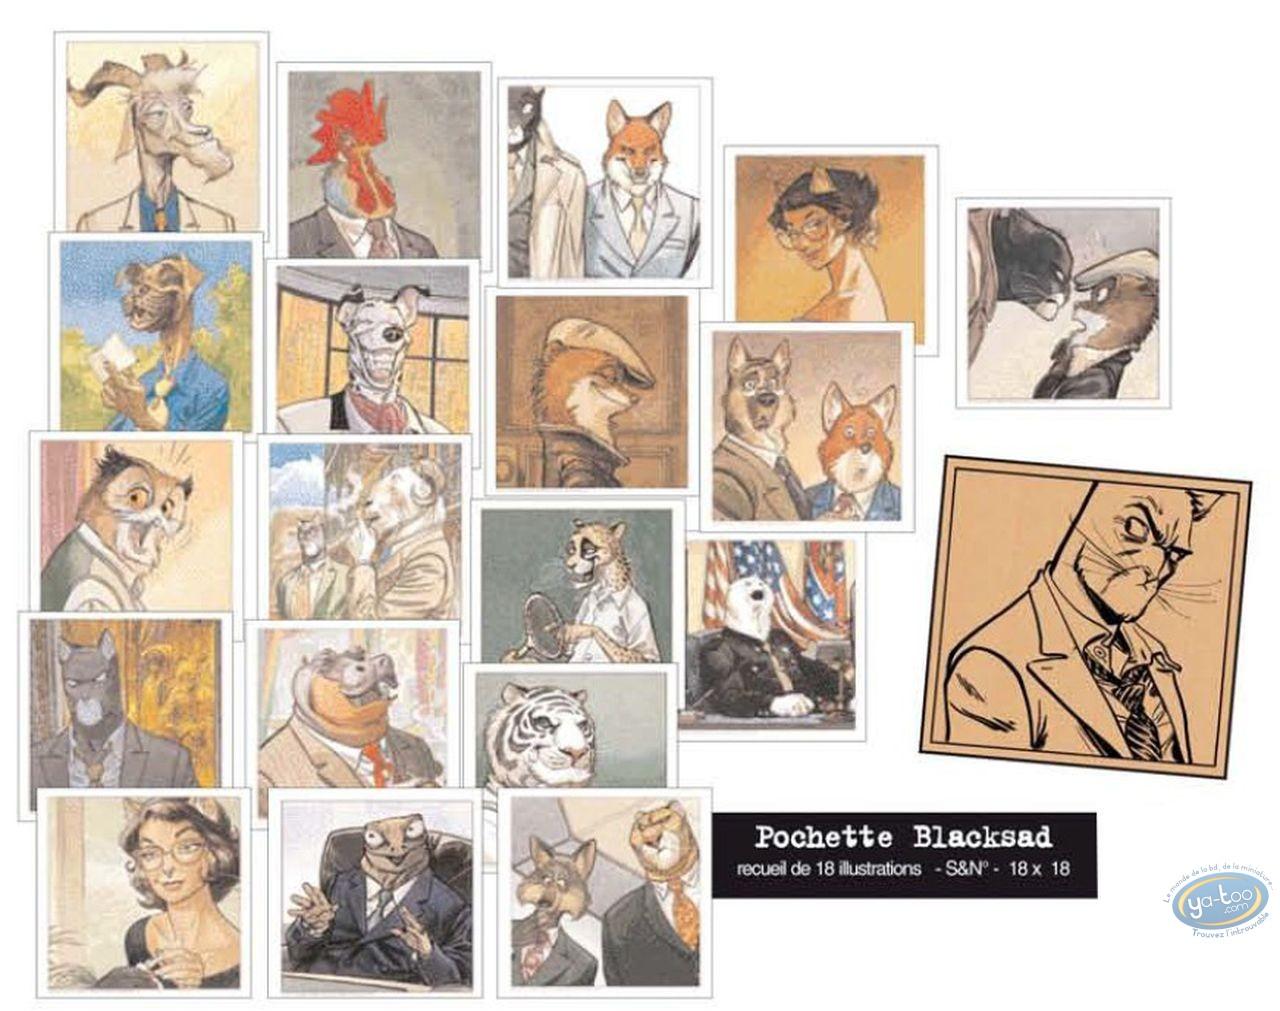 Portfolio, Blacksad : Collection of 18 Portraits